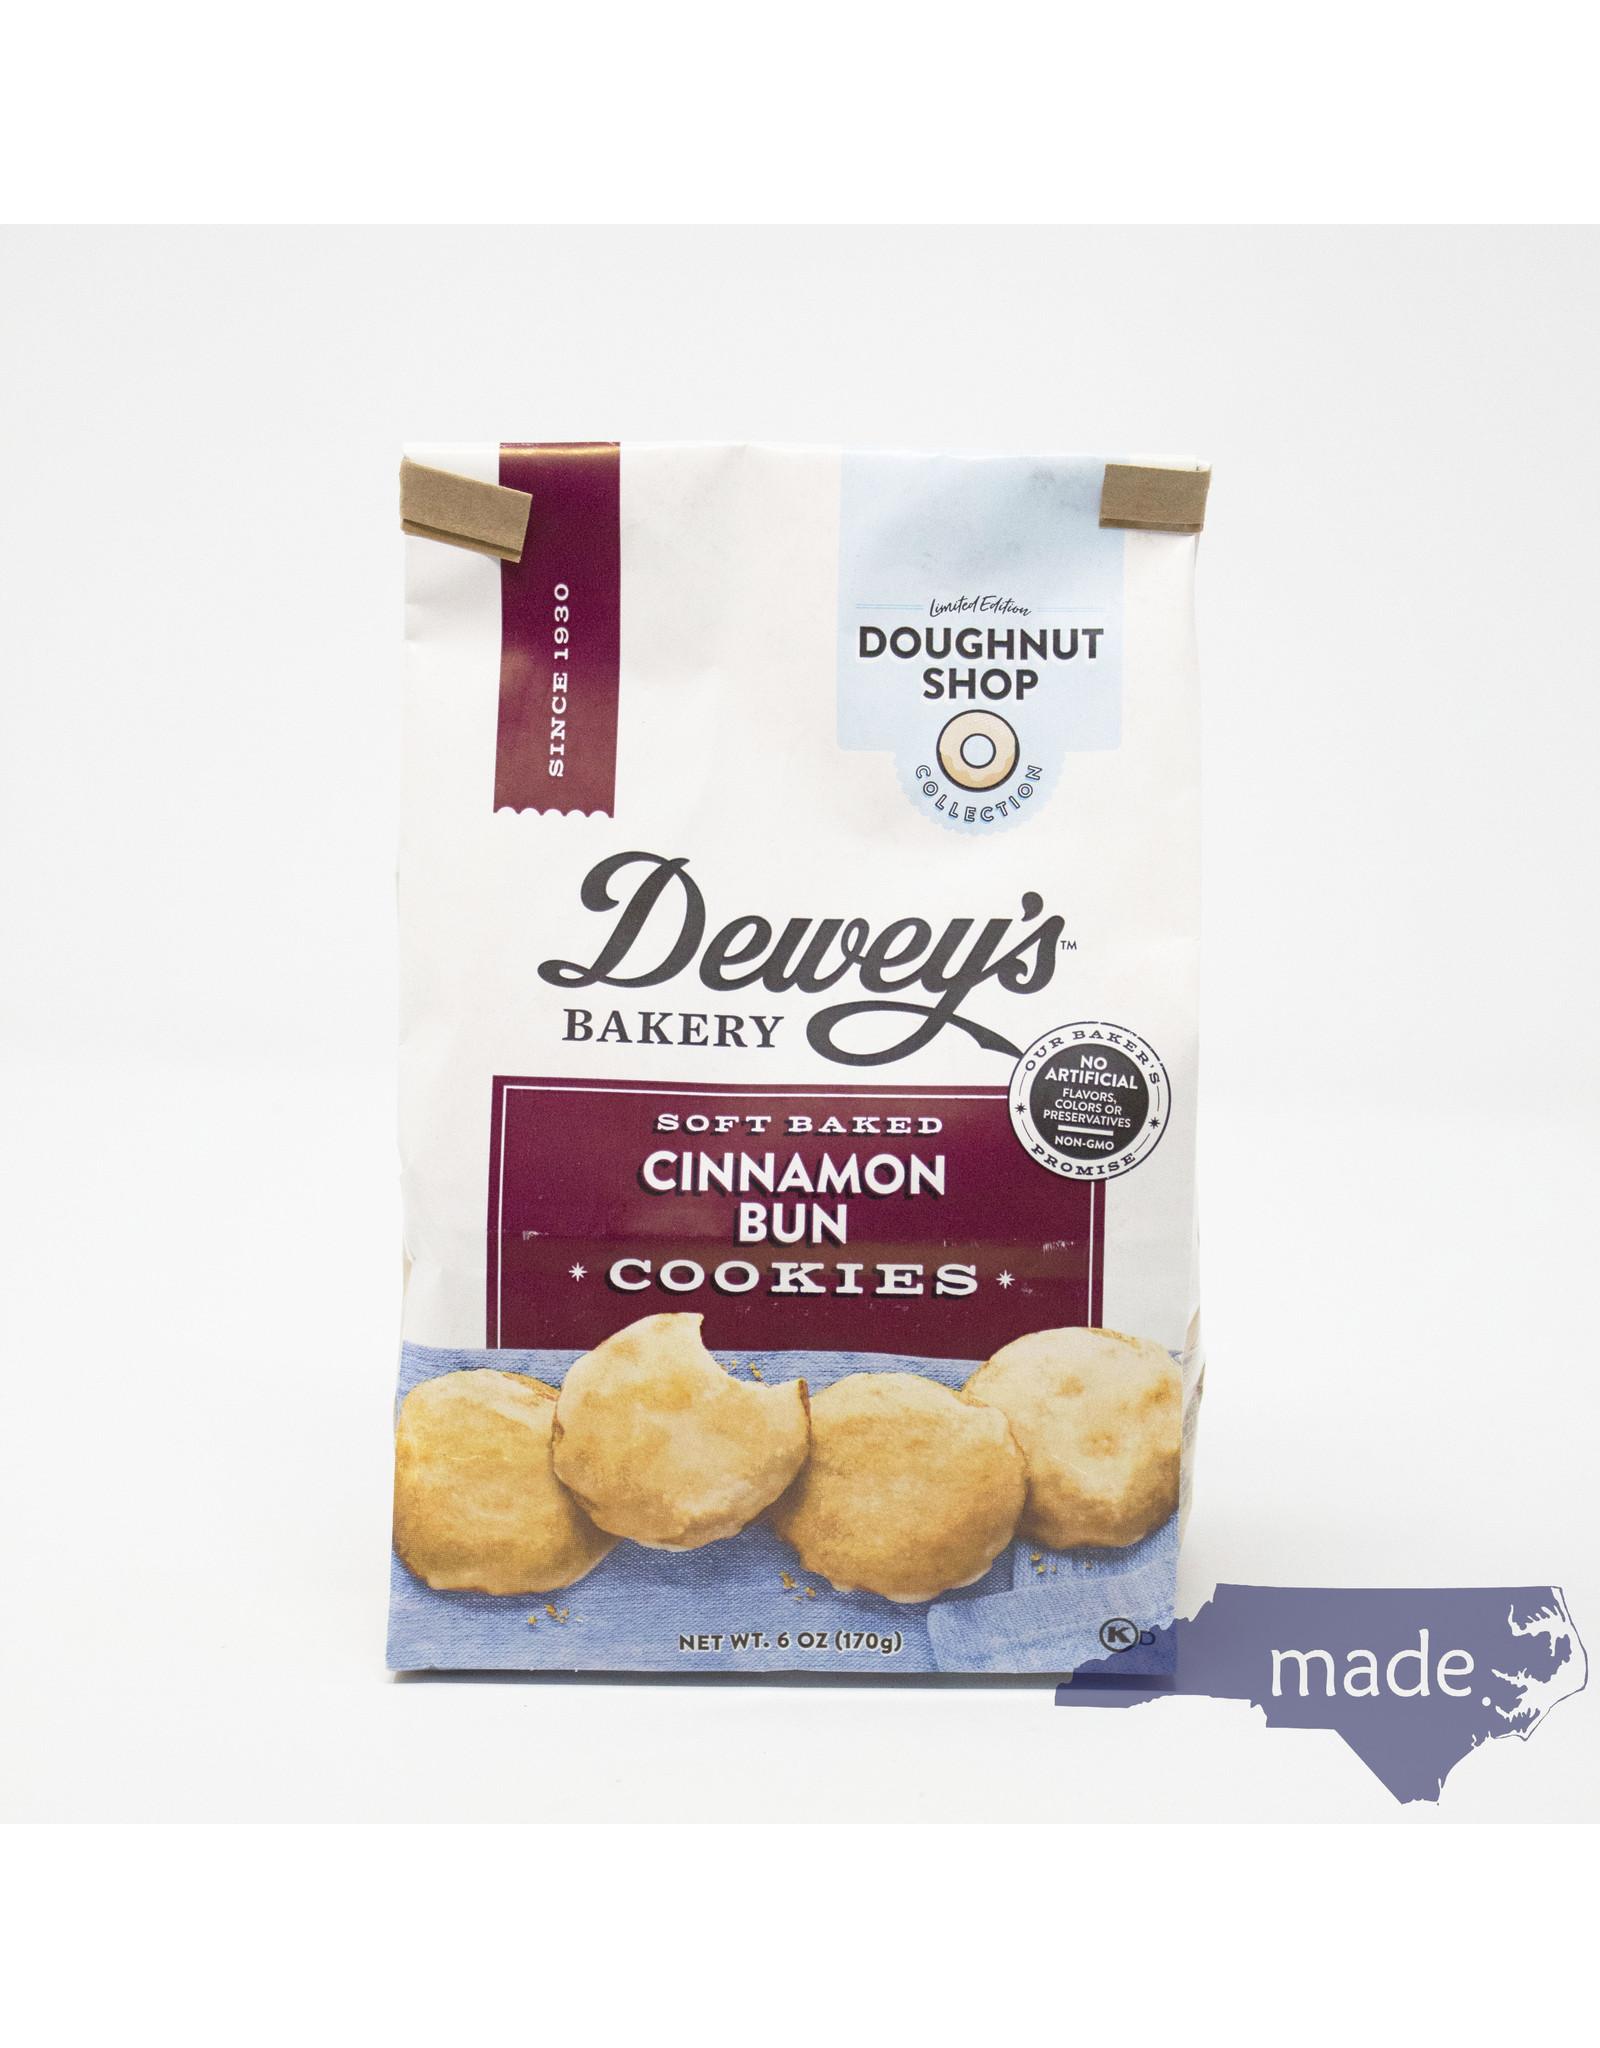 Dewey's Bakery Cinnamon Bun Soft Baked Cookies 6 oz. - Dewey's Bakery